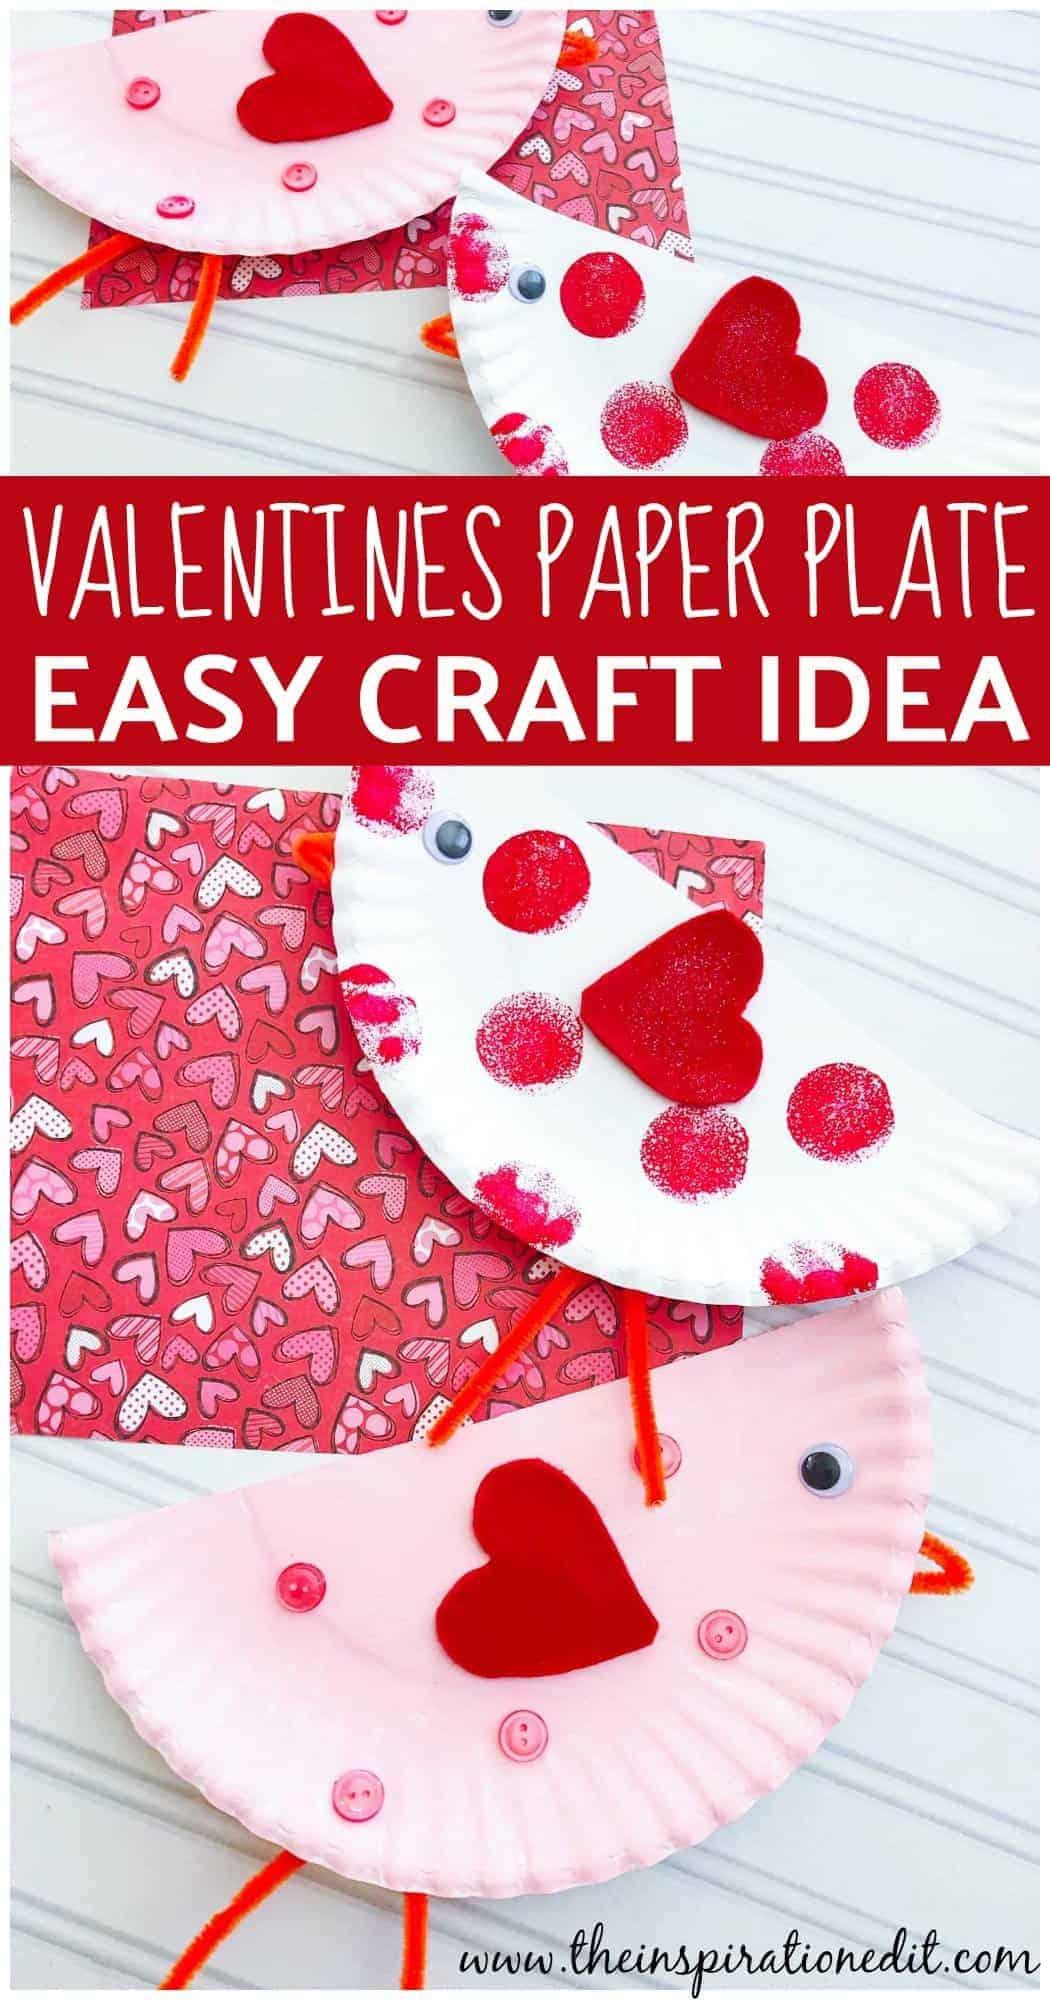 paper plate valentines craft idea for kids cute birds